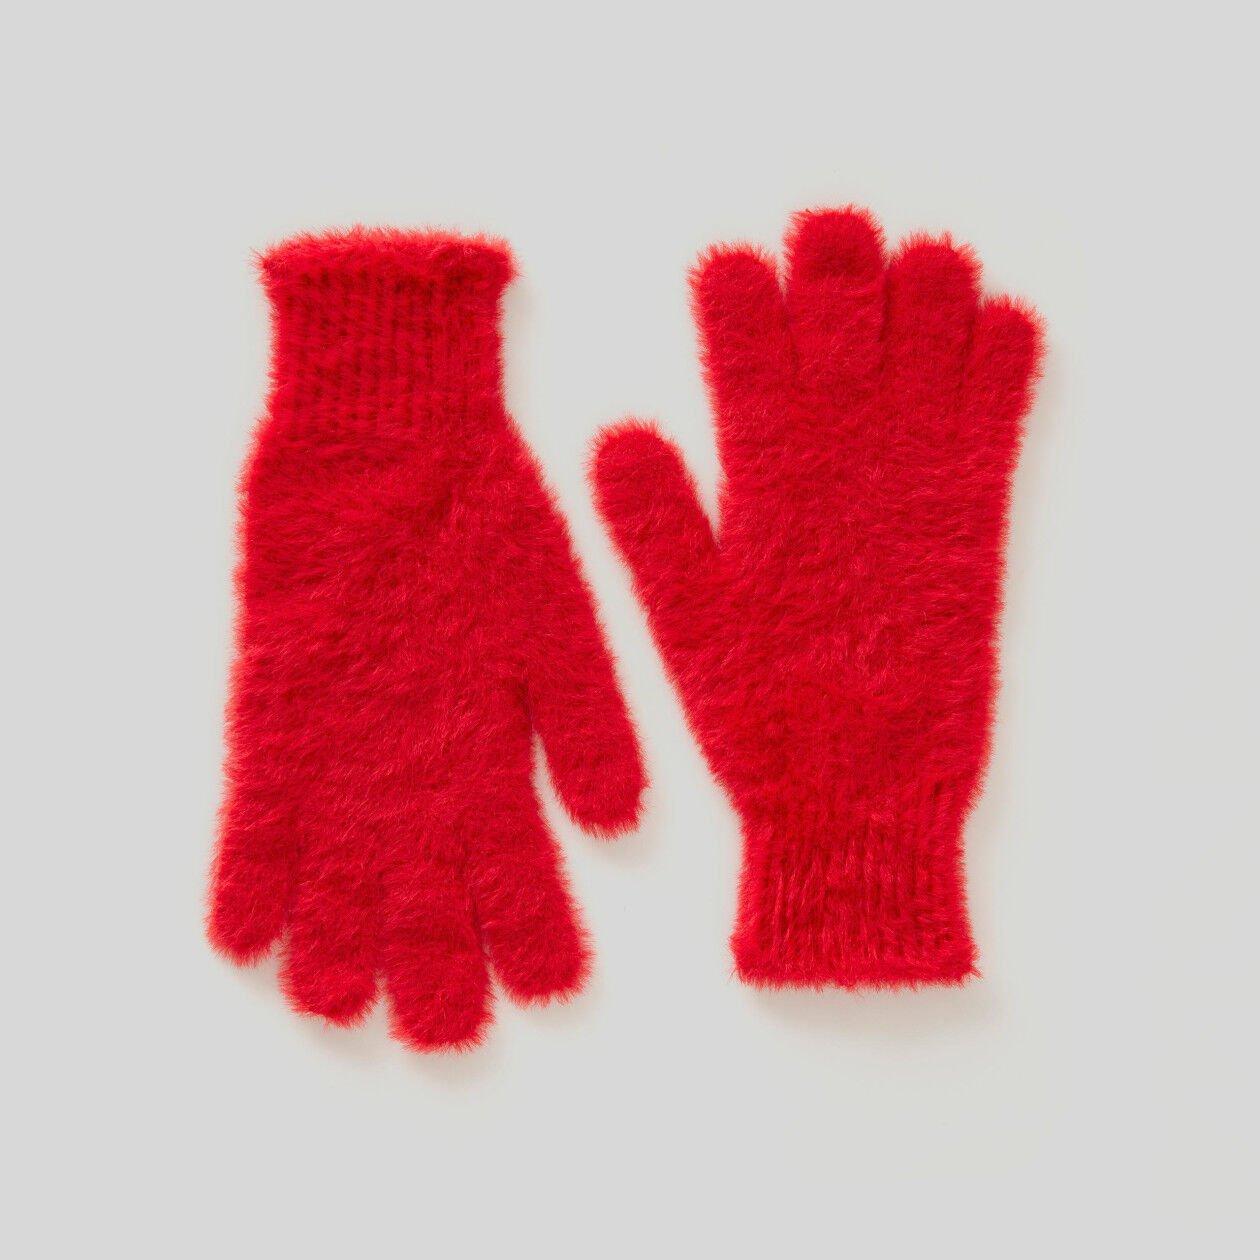 Handschuhe aus Langhaar-Garn